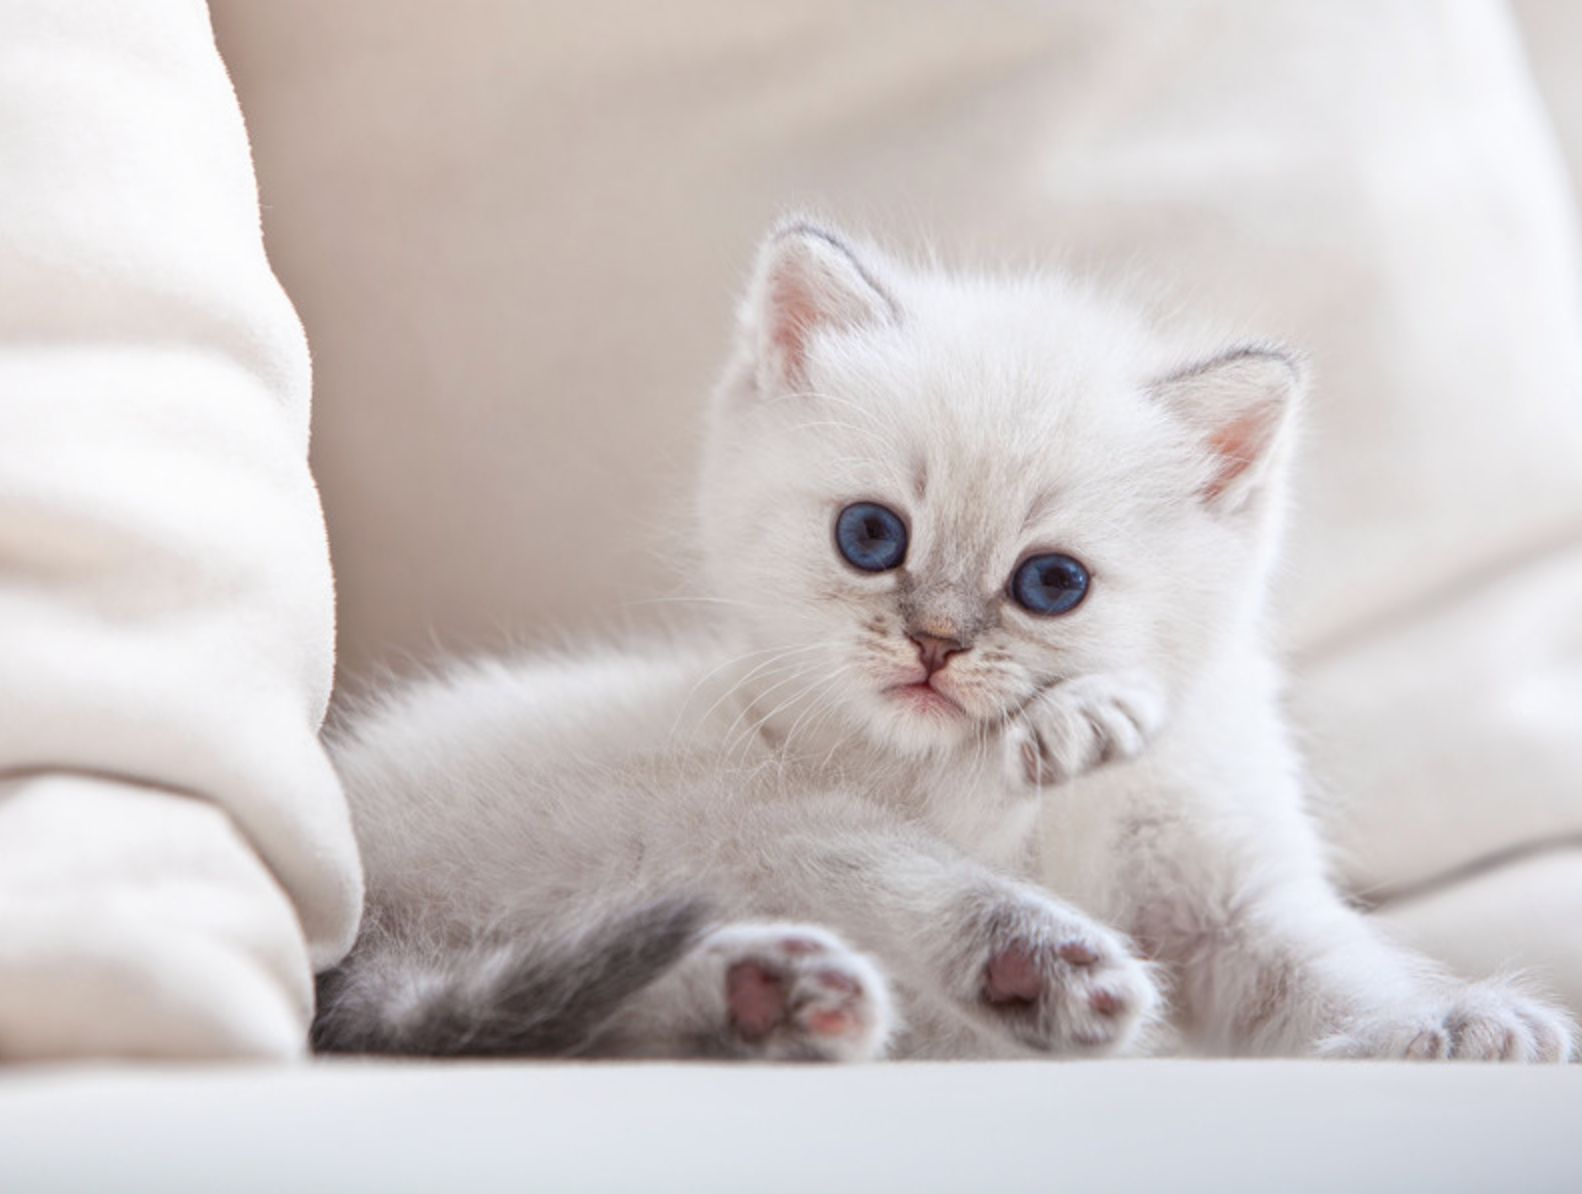 Official Website Kittens Cutest Cute Fluffy Kittens Kittens Funny